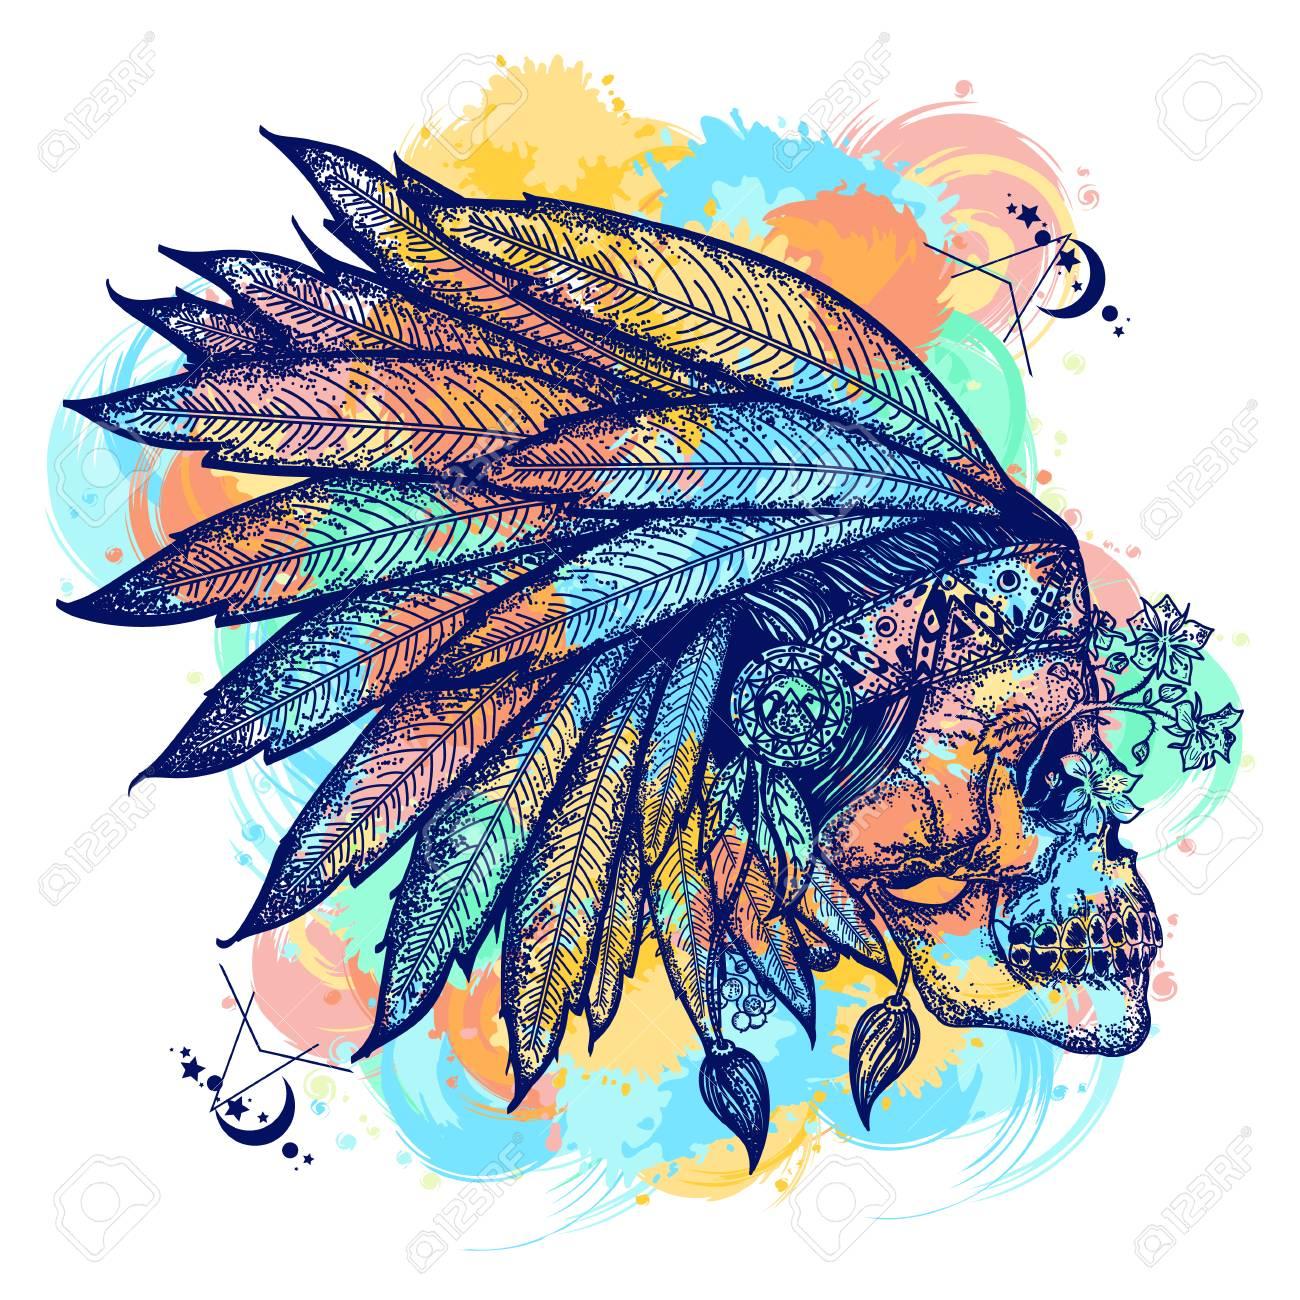 Arte Indio Del Tatuaje Del Color Del Cráneo. Símbolo Del Guerrero ...